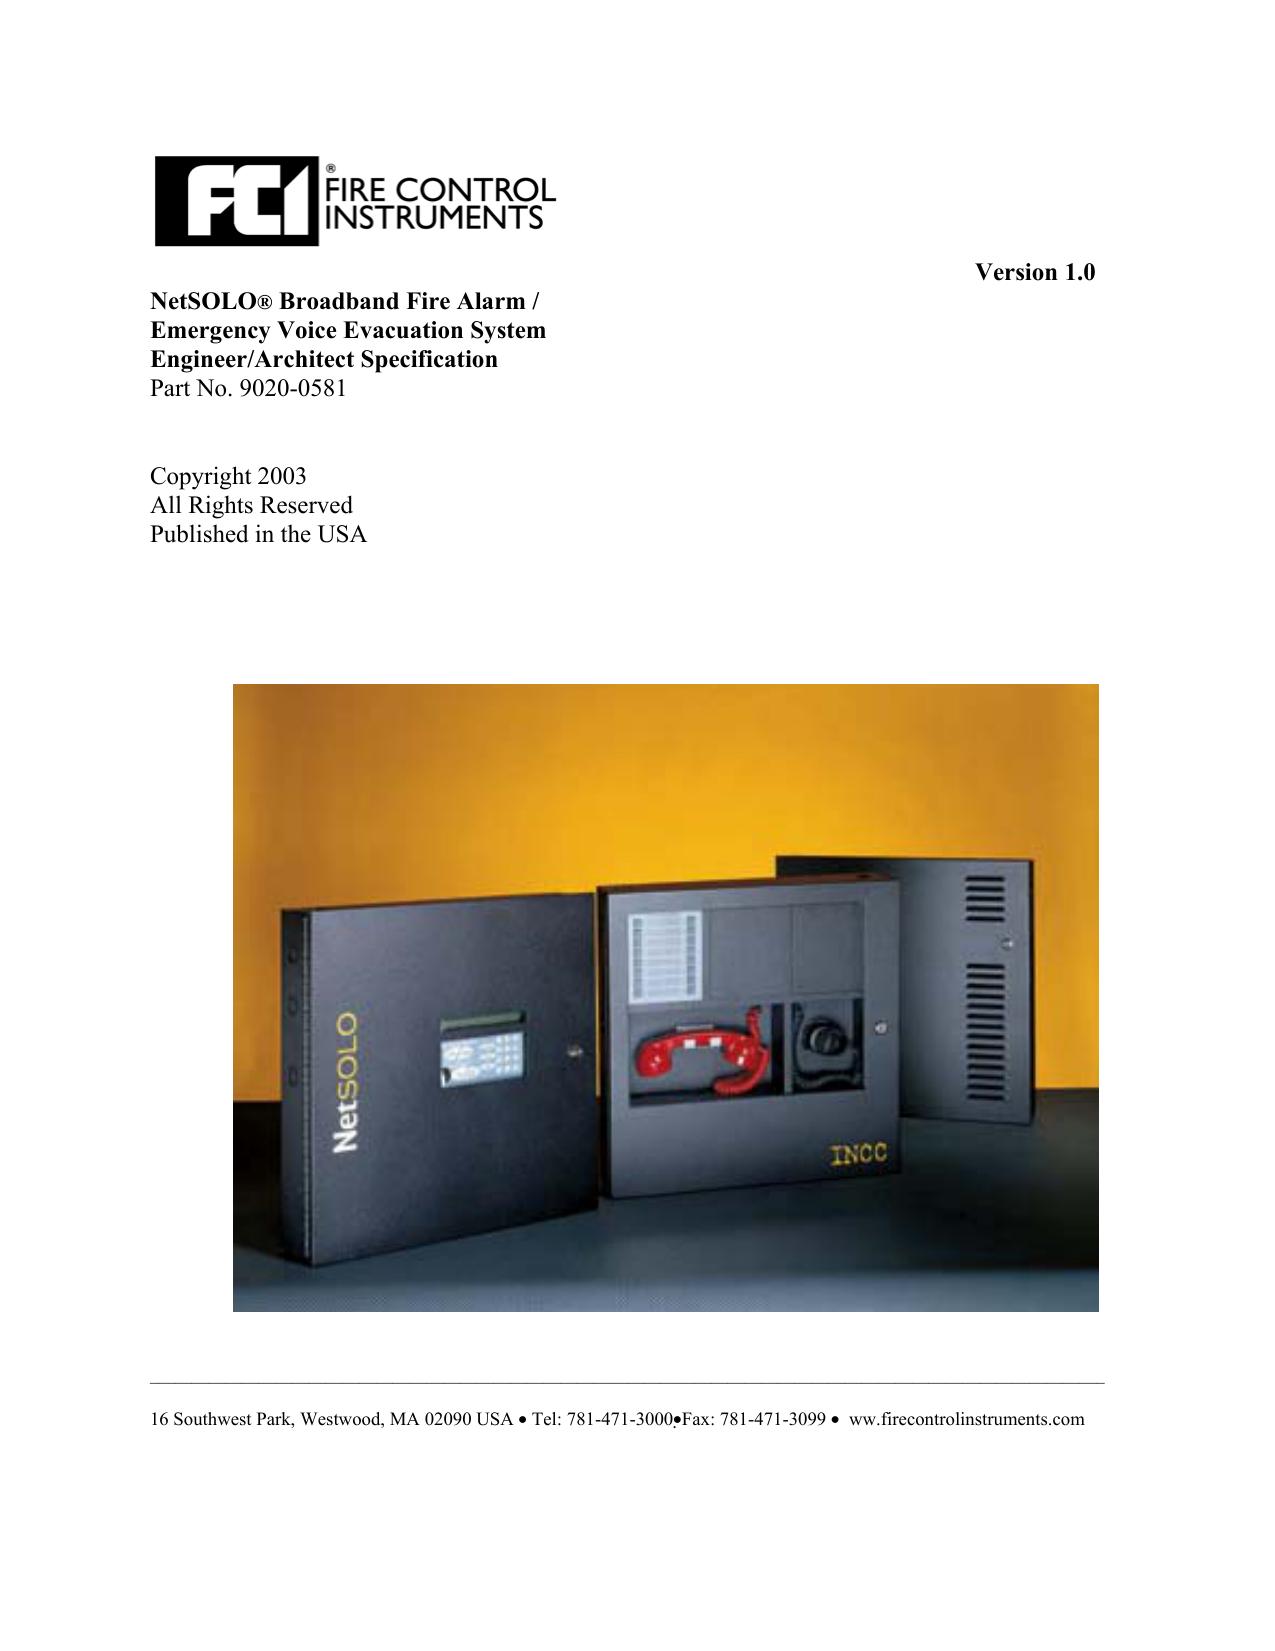 Version 1.0 NetSOLO® Broadband Fire Alarm - Gamewell-FCI ... on